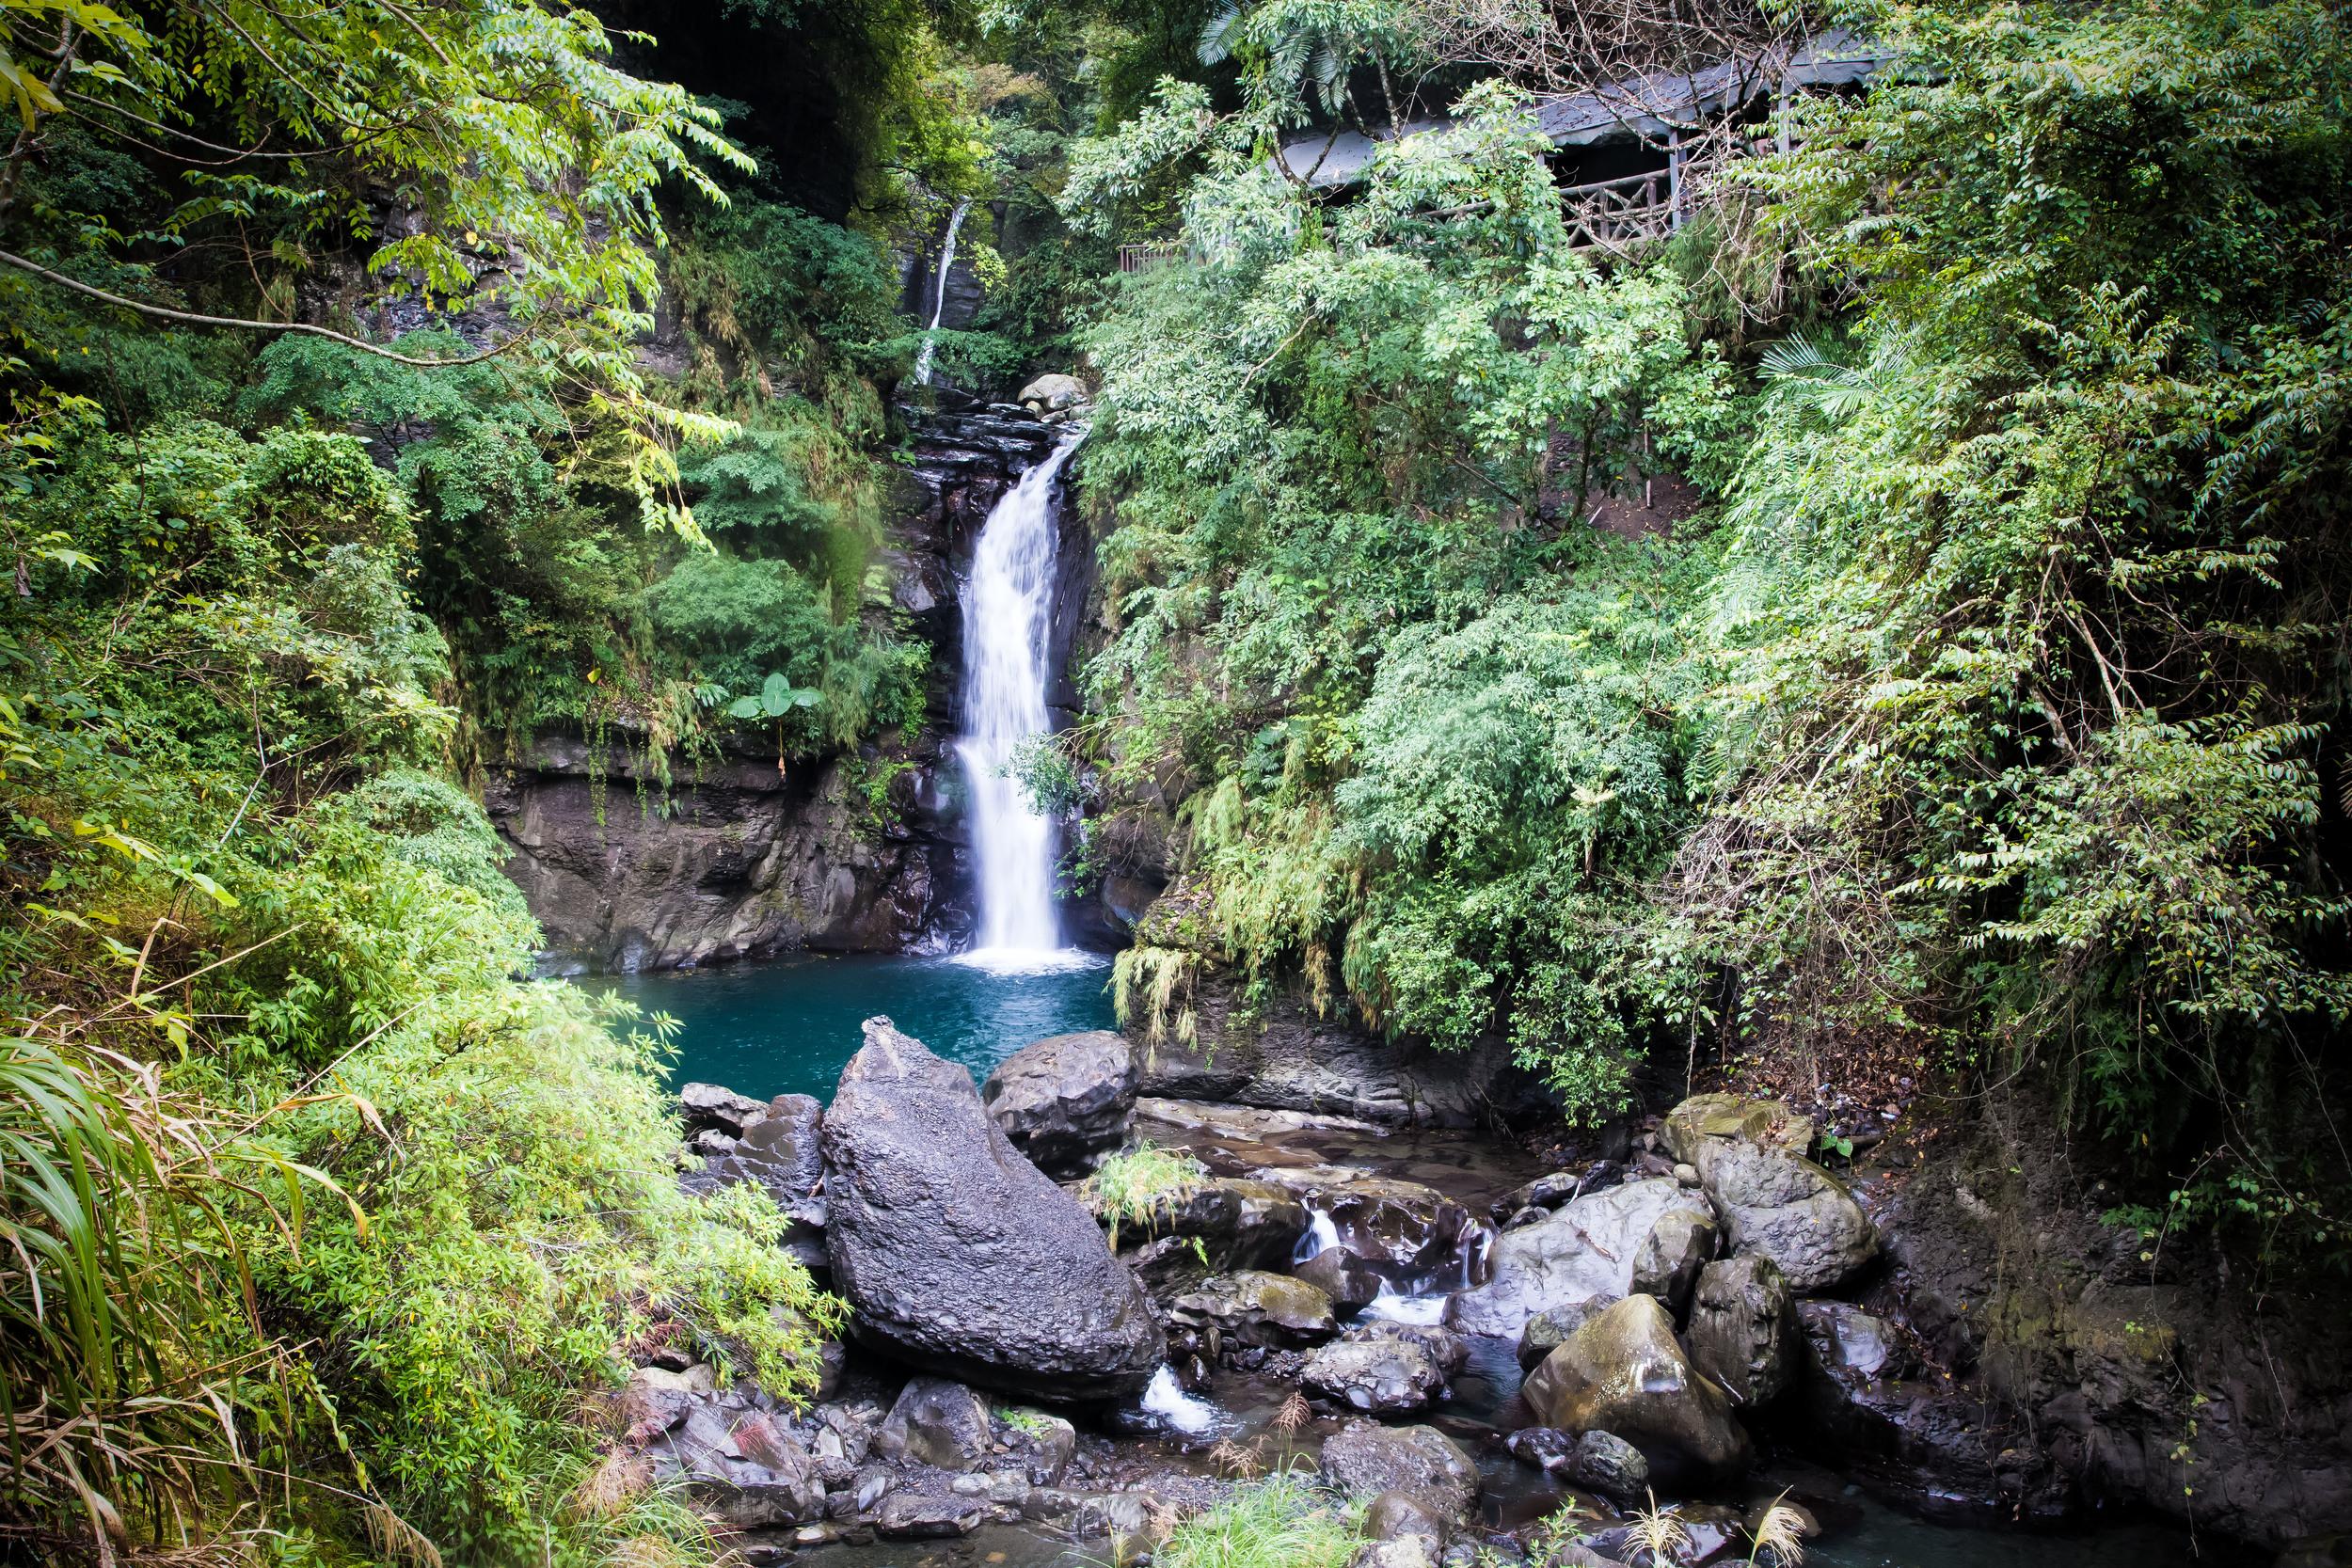 - Dragon Pheonix Waterfall (龍鳳瀑布)